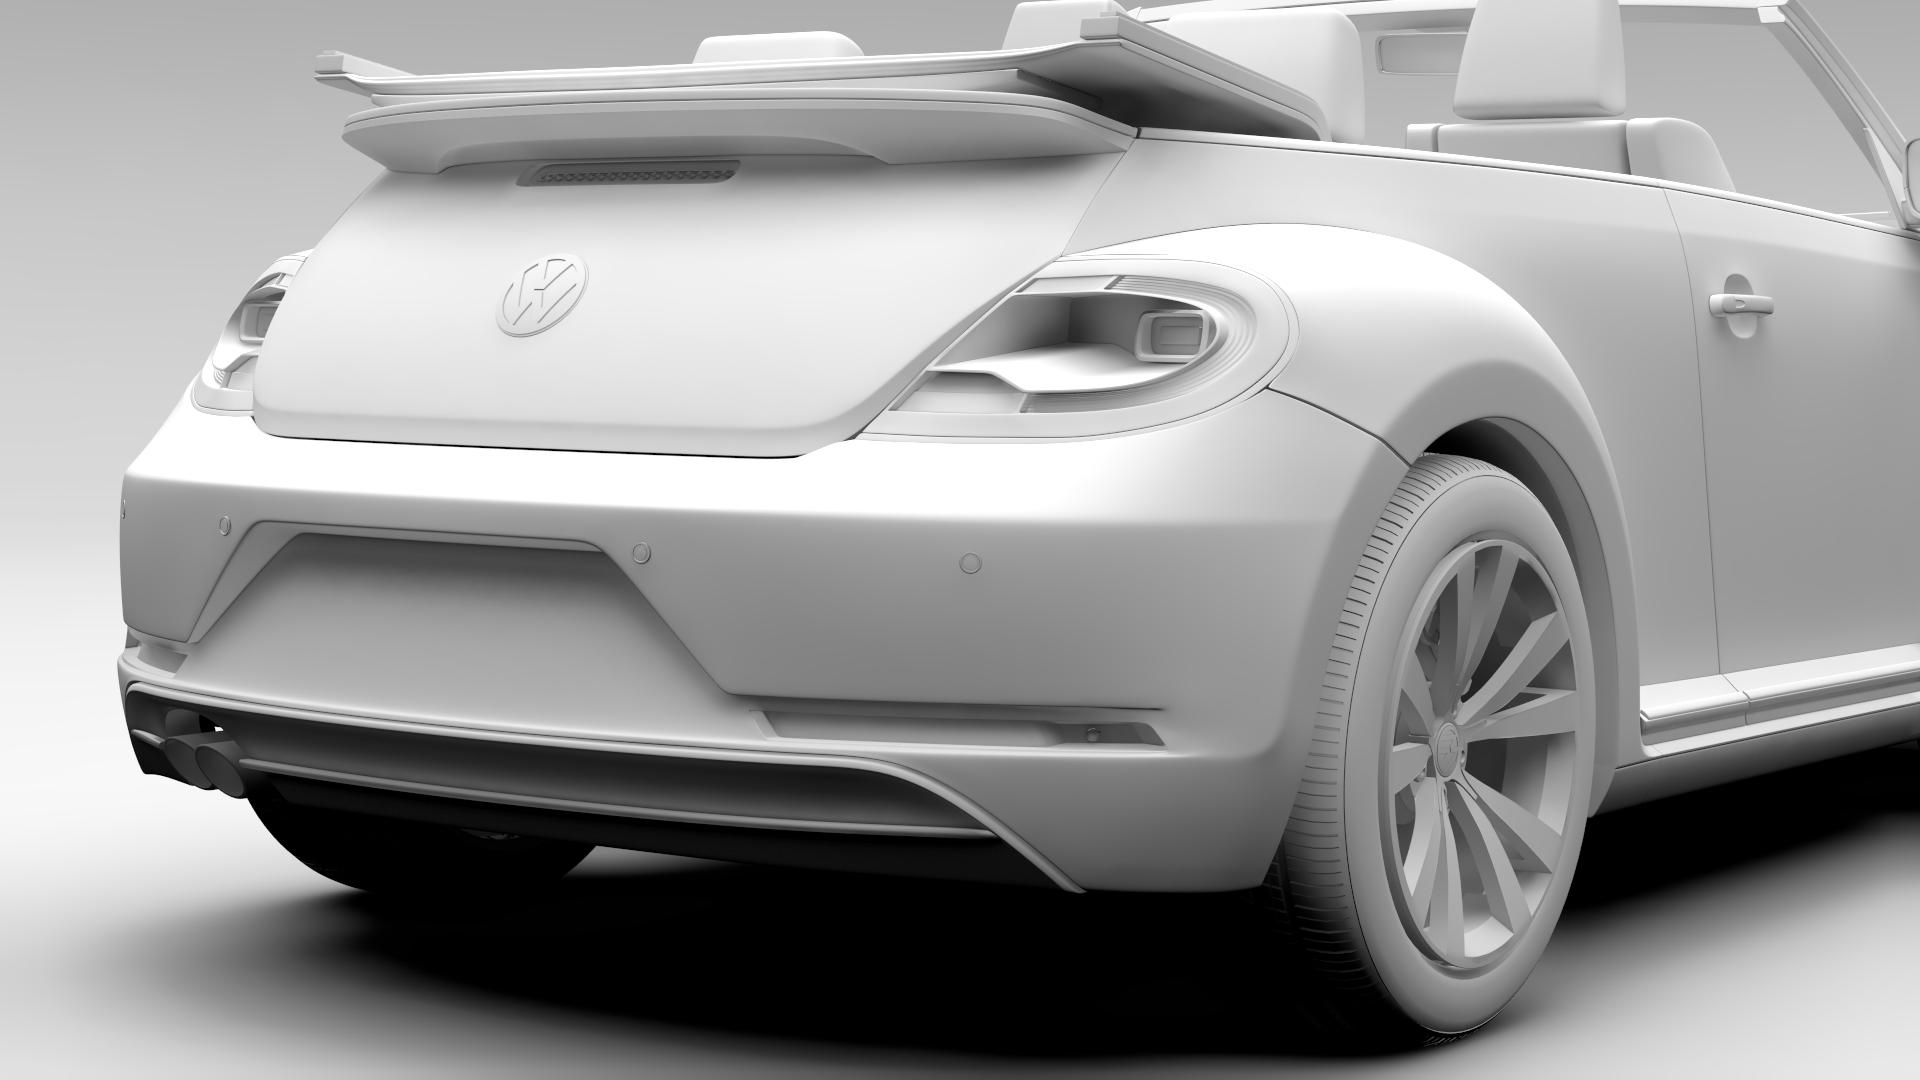 vw beetle cabriolet 2017 3d model 3ds max fbx c4d lwo ma mb hrc xsi obj 221606